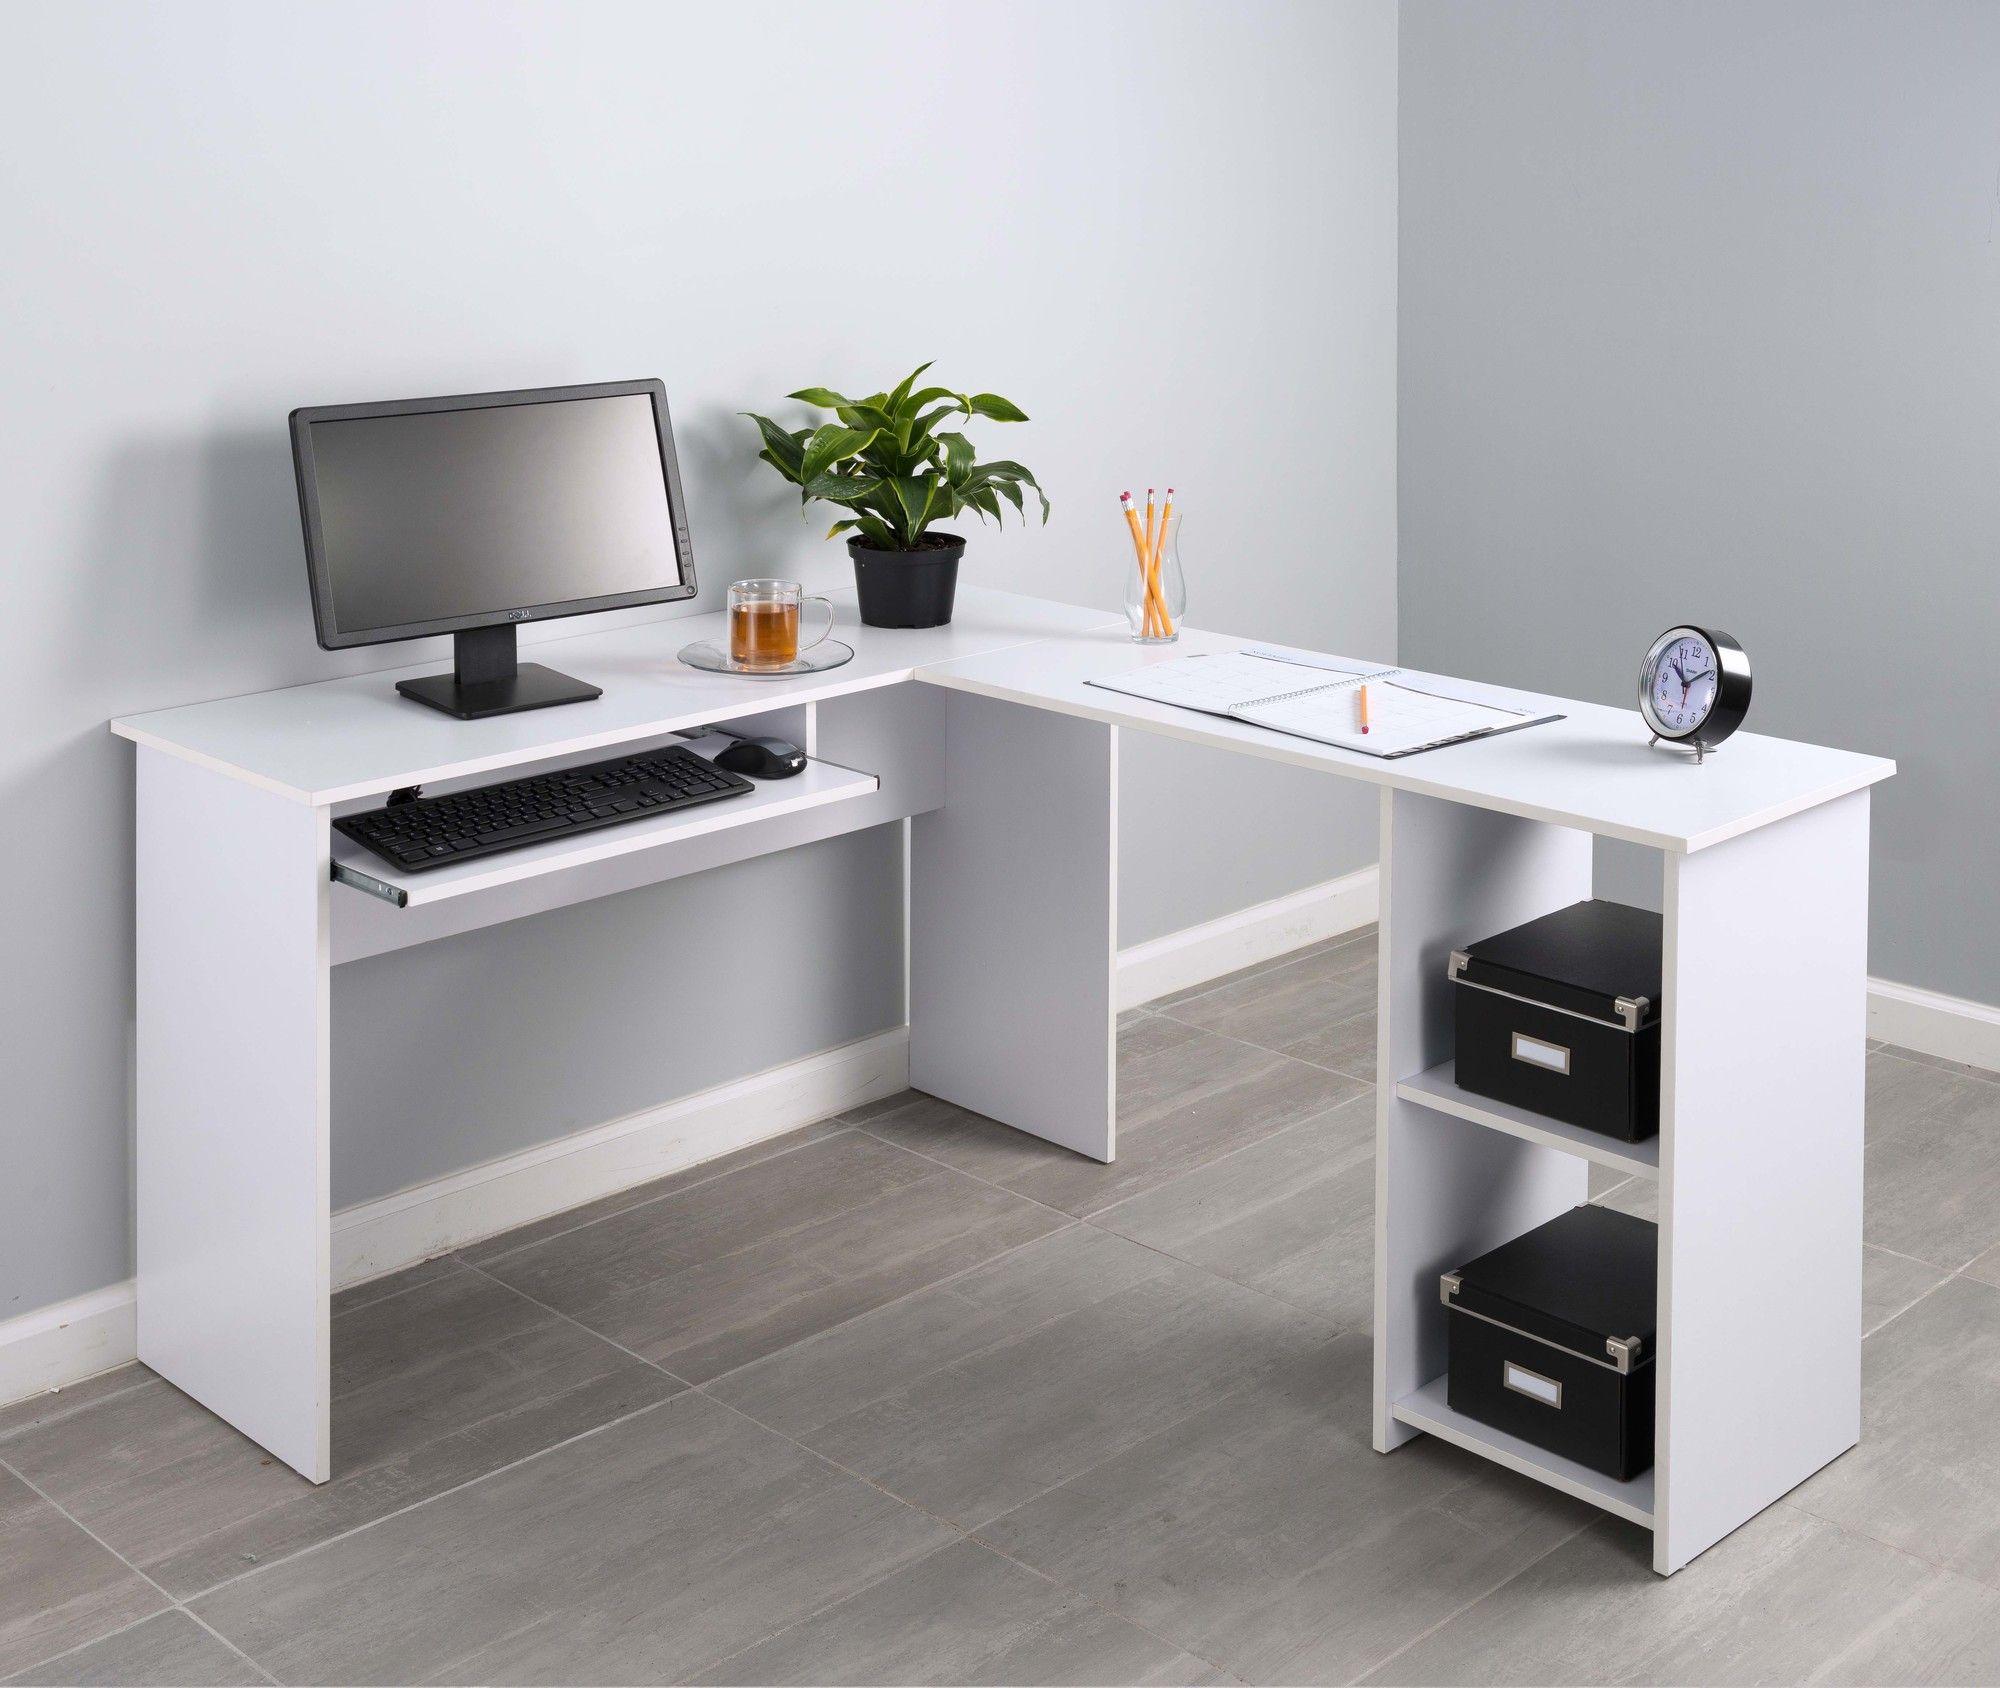 computer desks riverside hutch desk cfm riversidebridgeportlshapedcomputerdeskwithoptionalhutch inuse shaped product l hayneedle bridgeport with optional